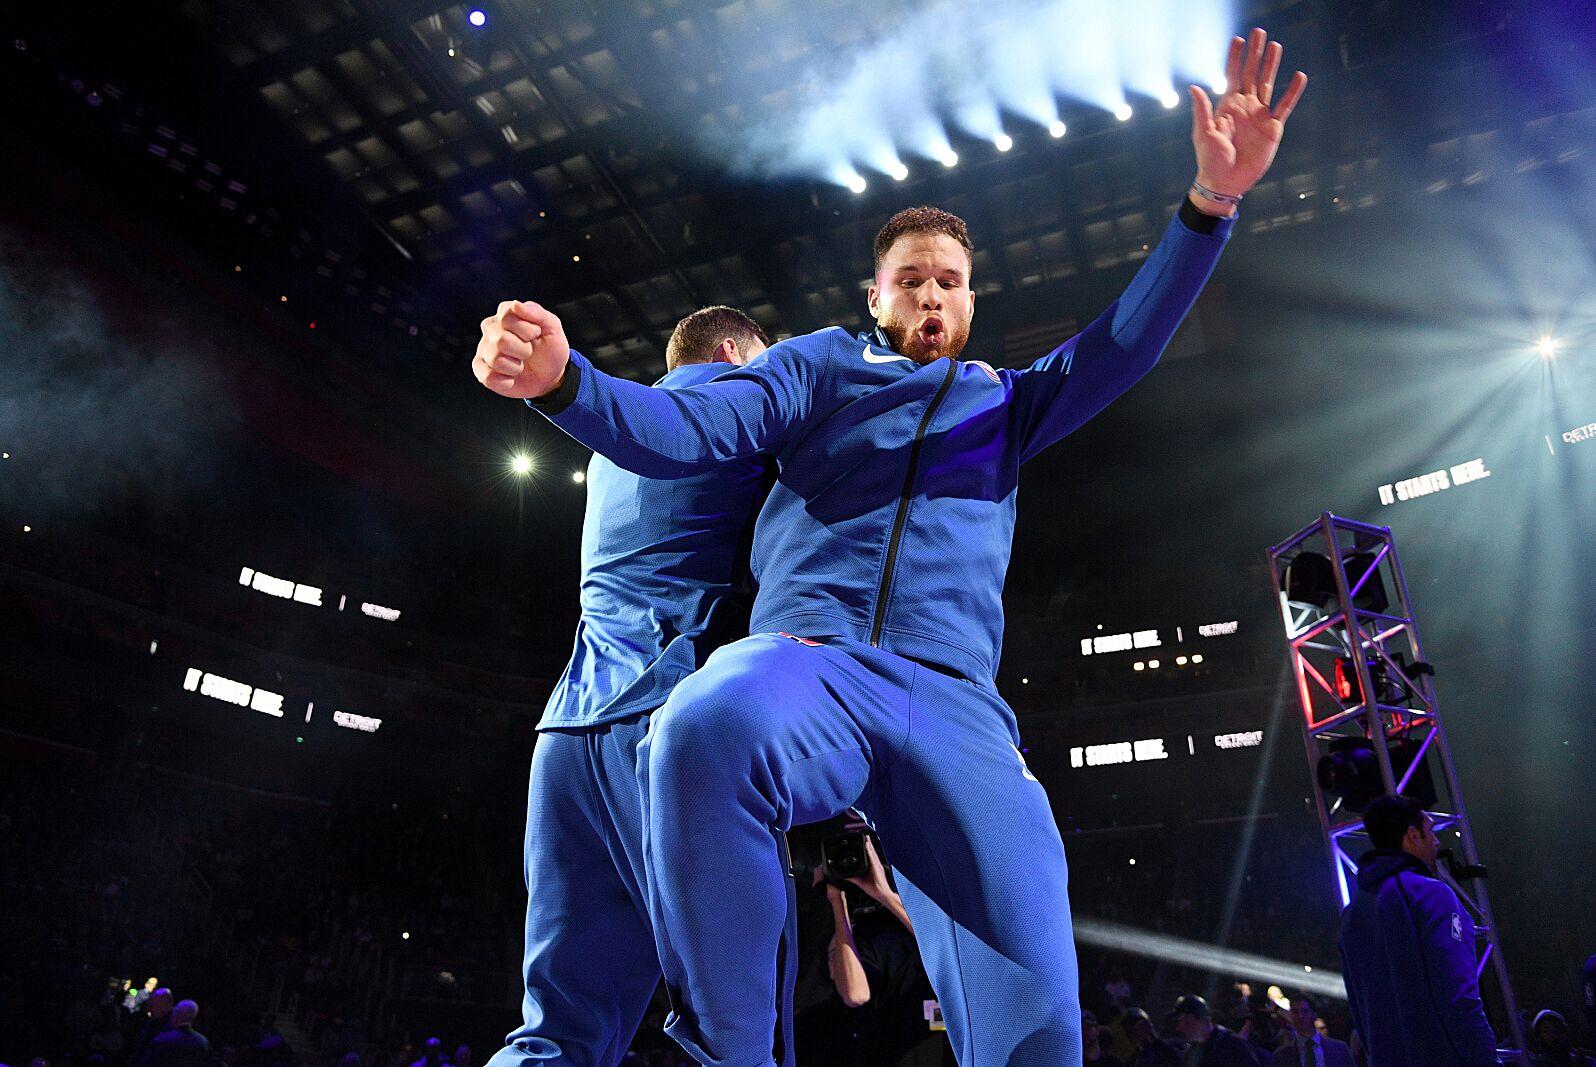 Detroit Pistons 2019-2020 Preview: Blake Griffin